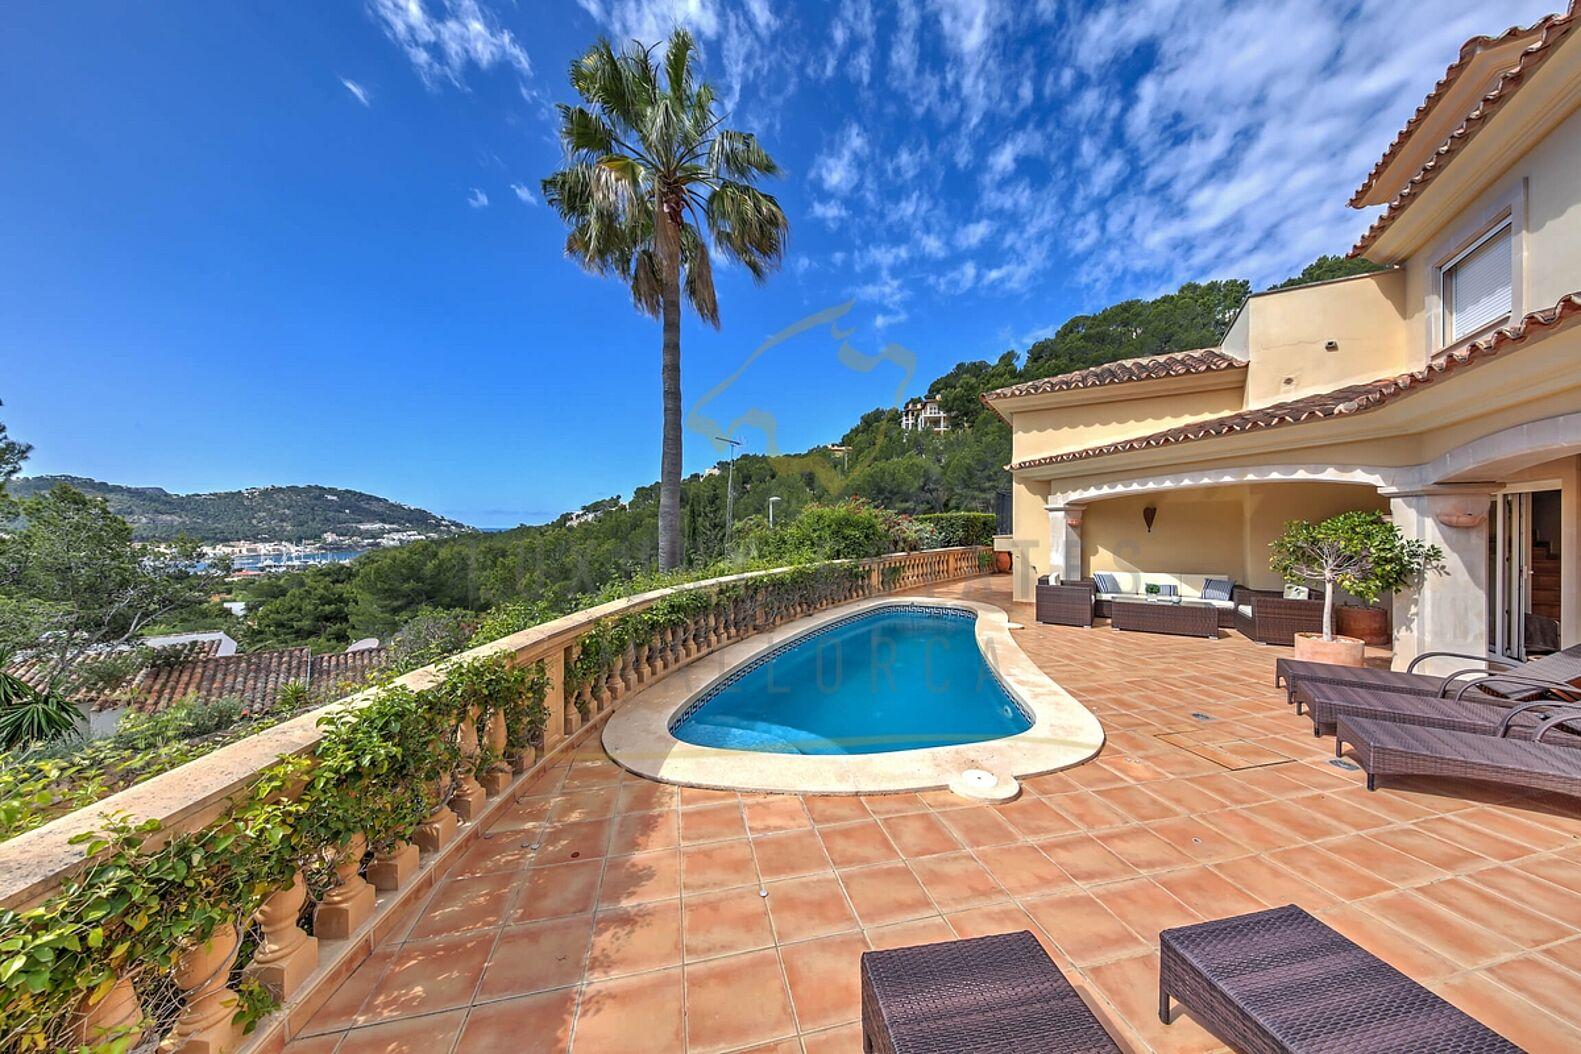 mallorca villa in puerto de andratx mit hafenblick kaufen. Black Bedroom Furniture Sets. Home Design Ideas